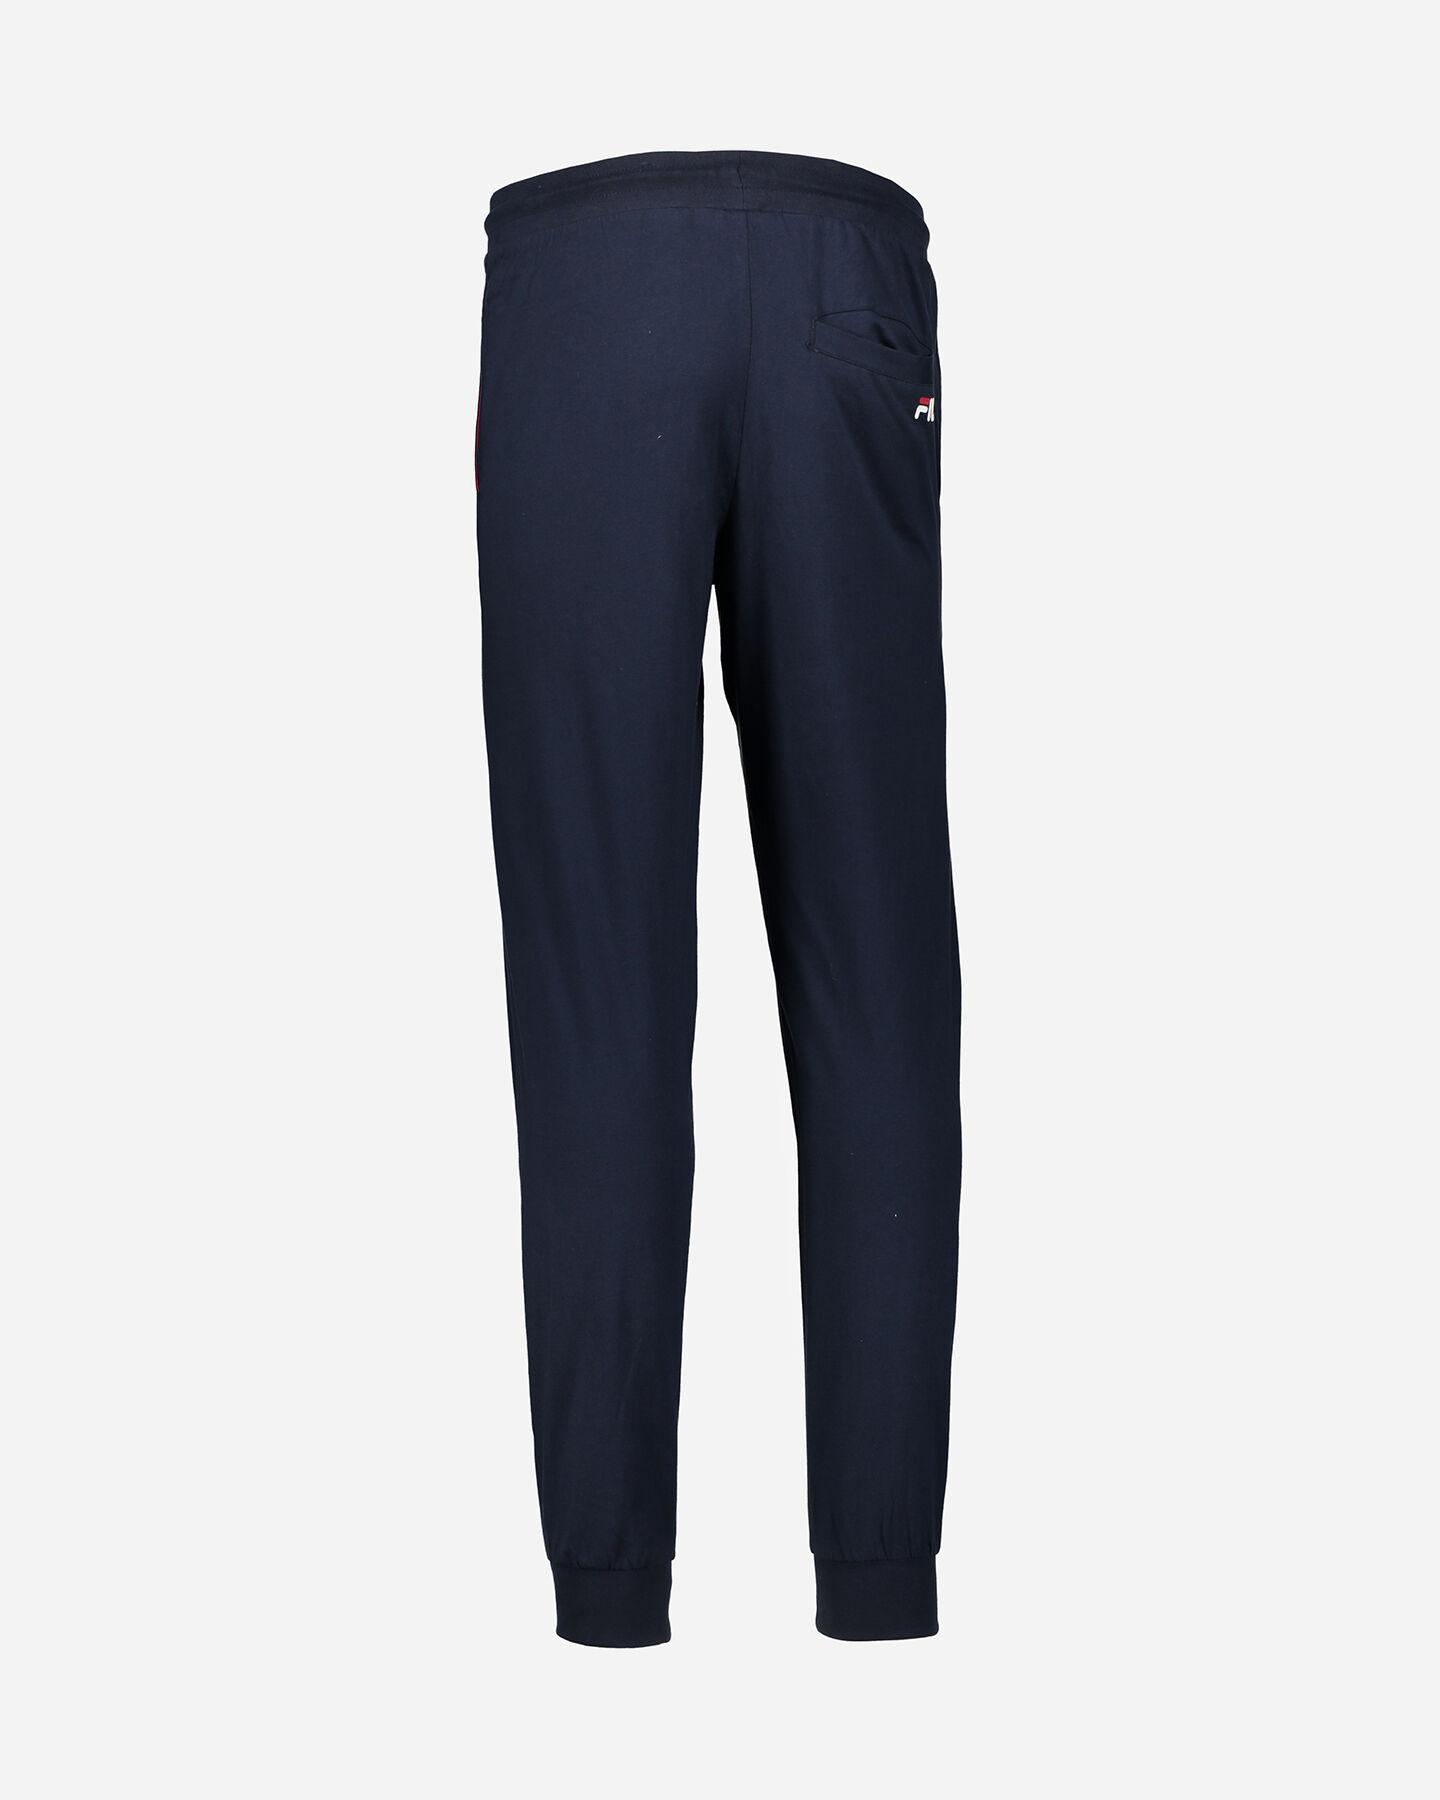 Pantalone FILA CUFF SPORT PANTS M S4034297 scatto 5